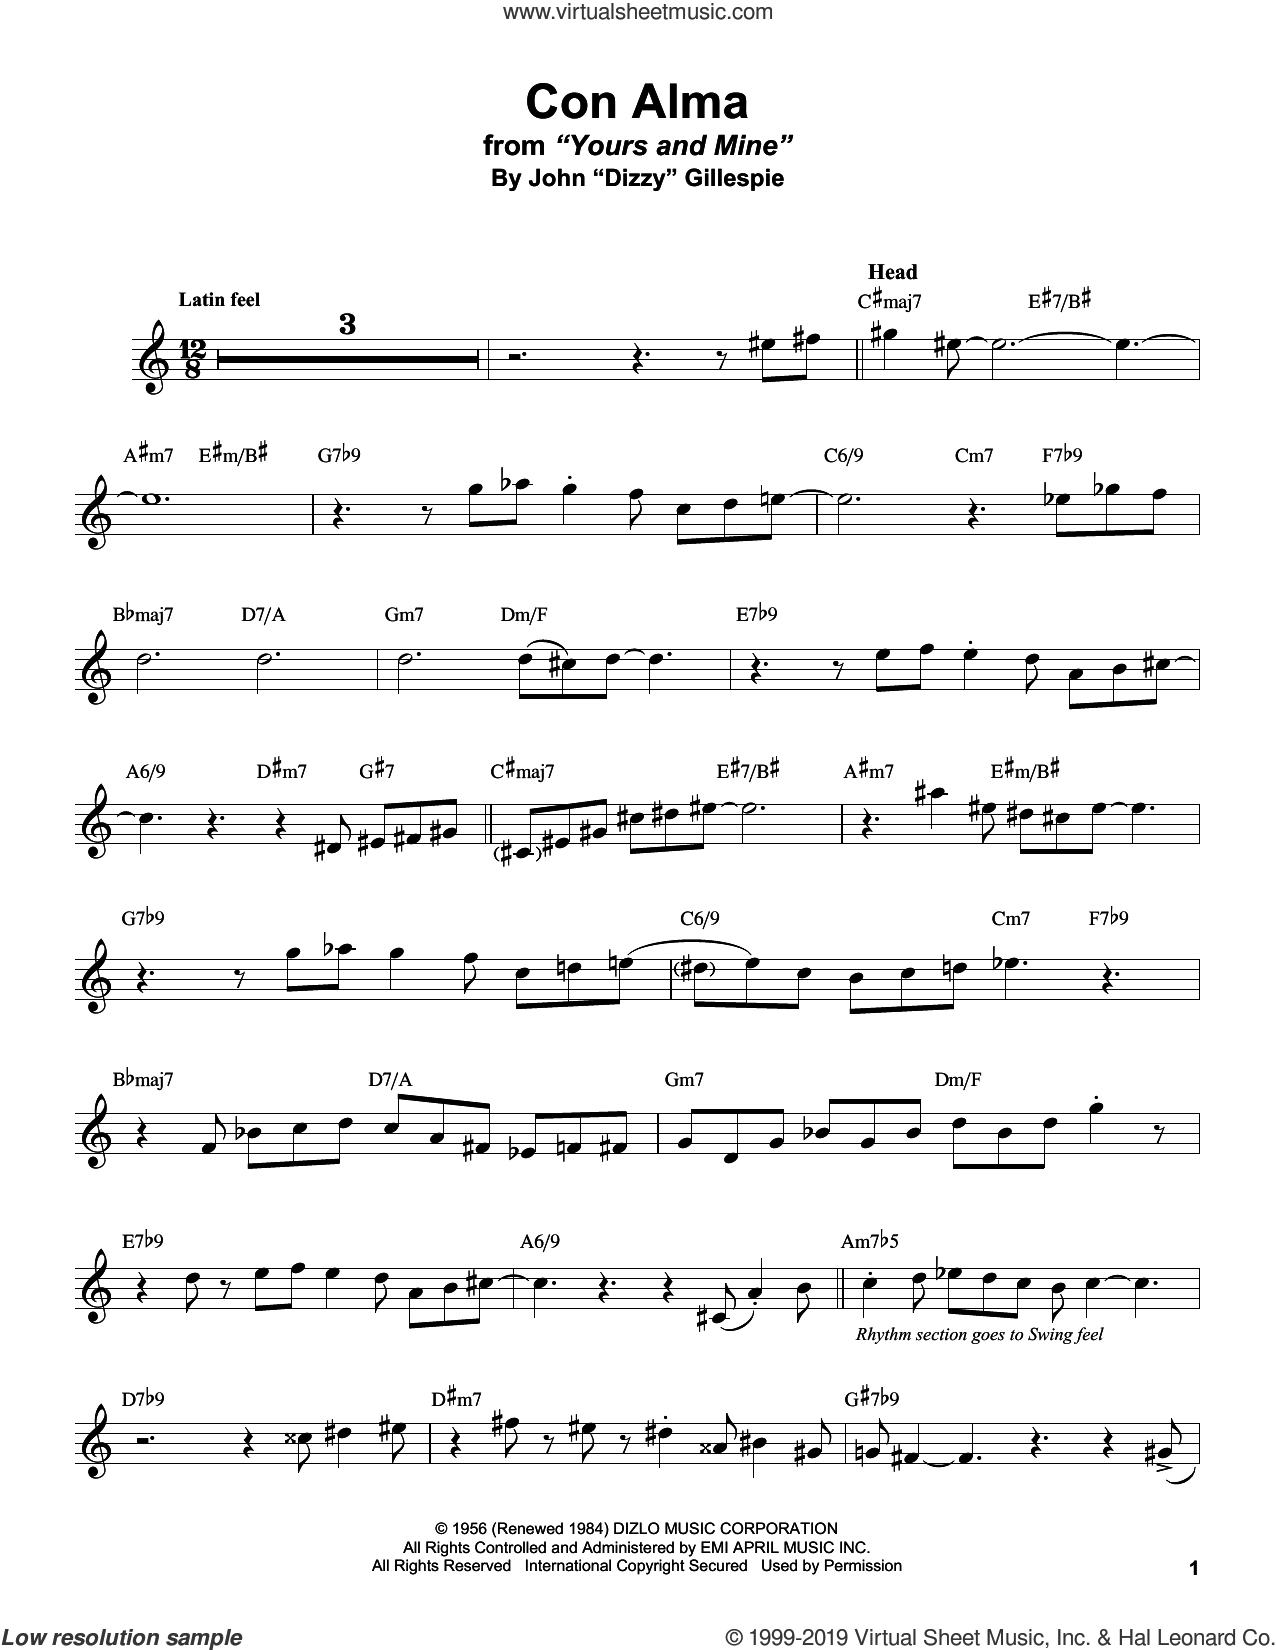 Con Alma sheet music for alto saxophone (transcription) by Stan Getz and Dizzy Gillespie, intermediate skill level